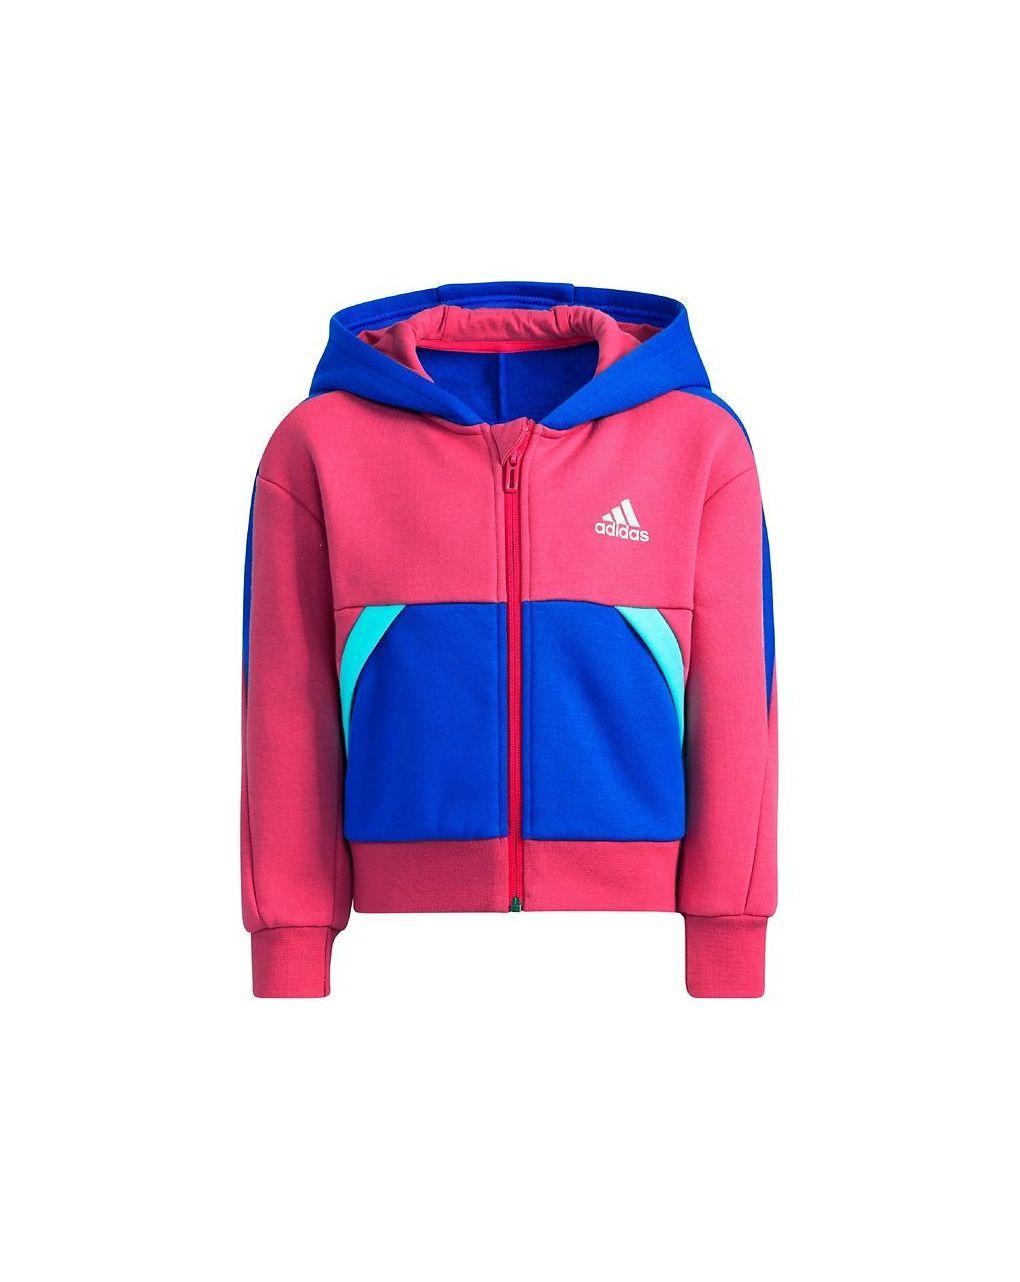 Adidas Ζακέτα Φόρμας Core Πολύχρωμη για Κορίτσι H39310